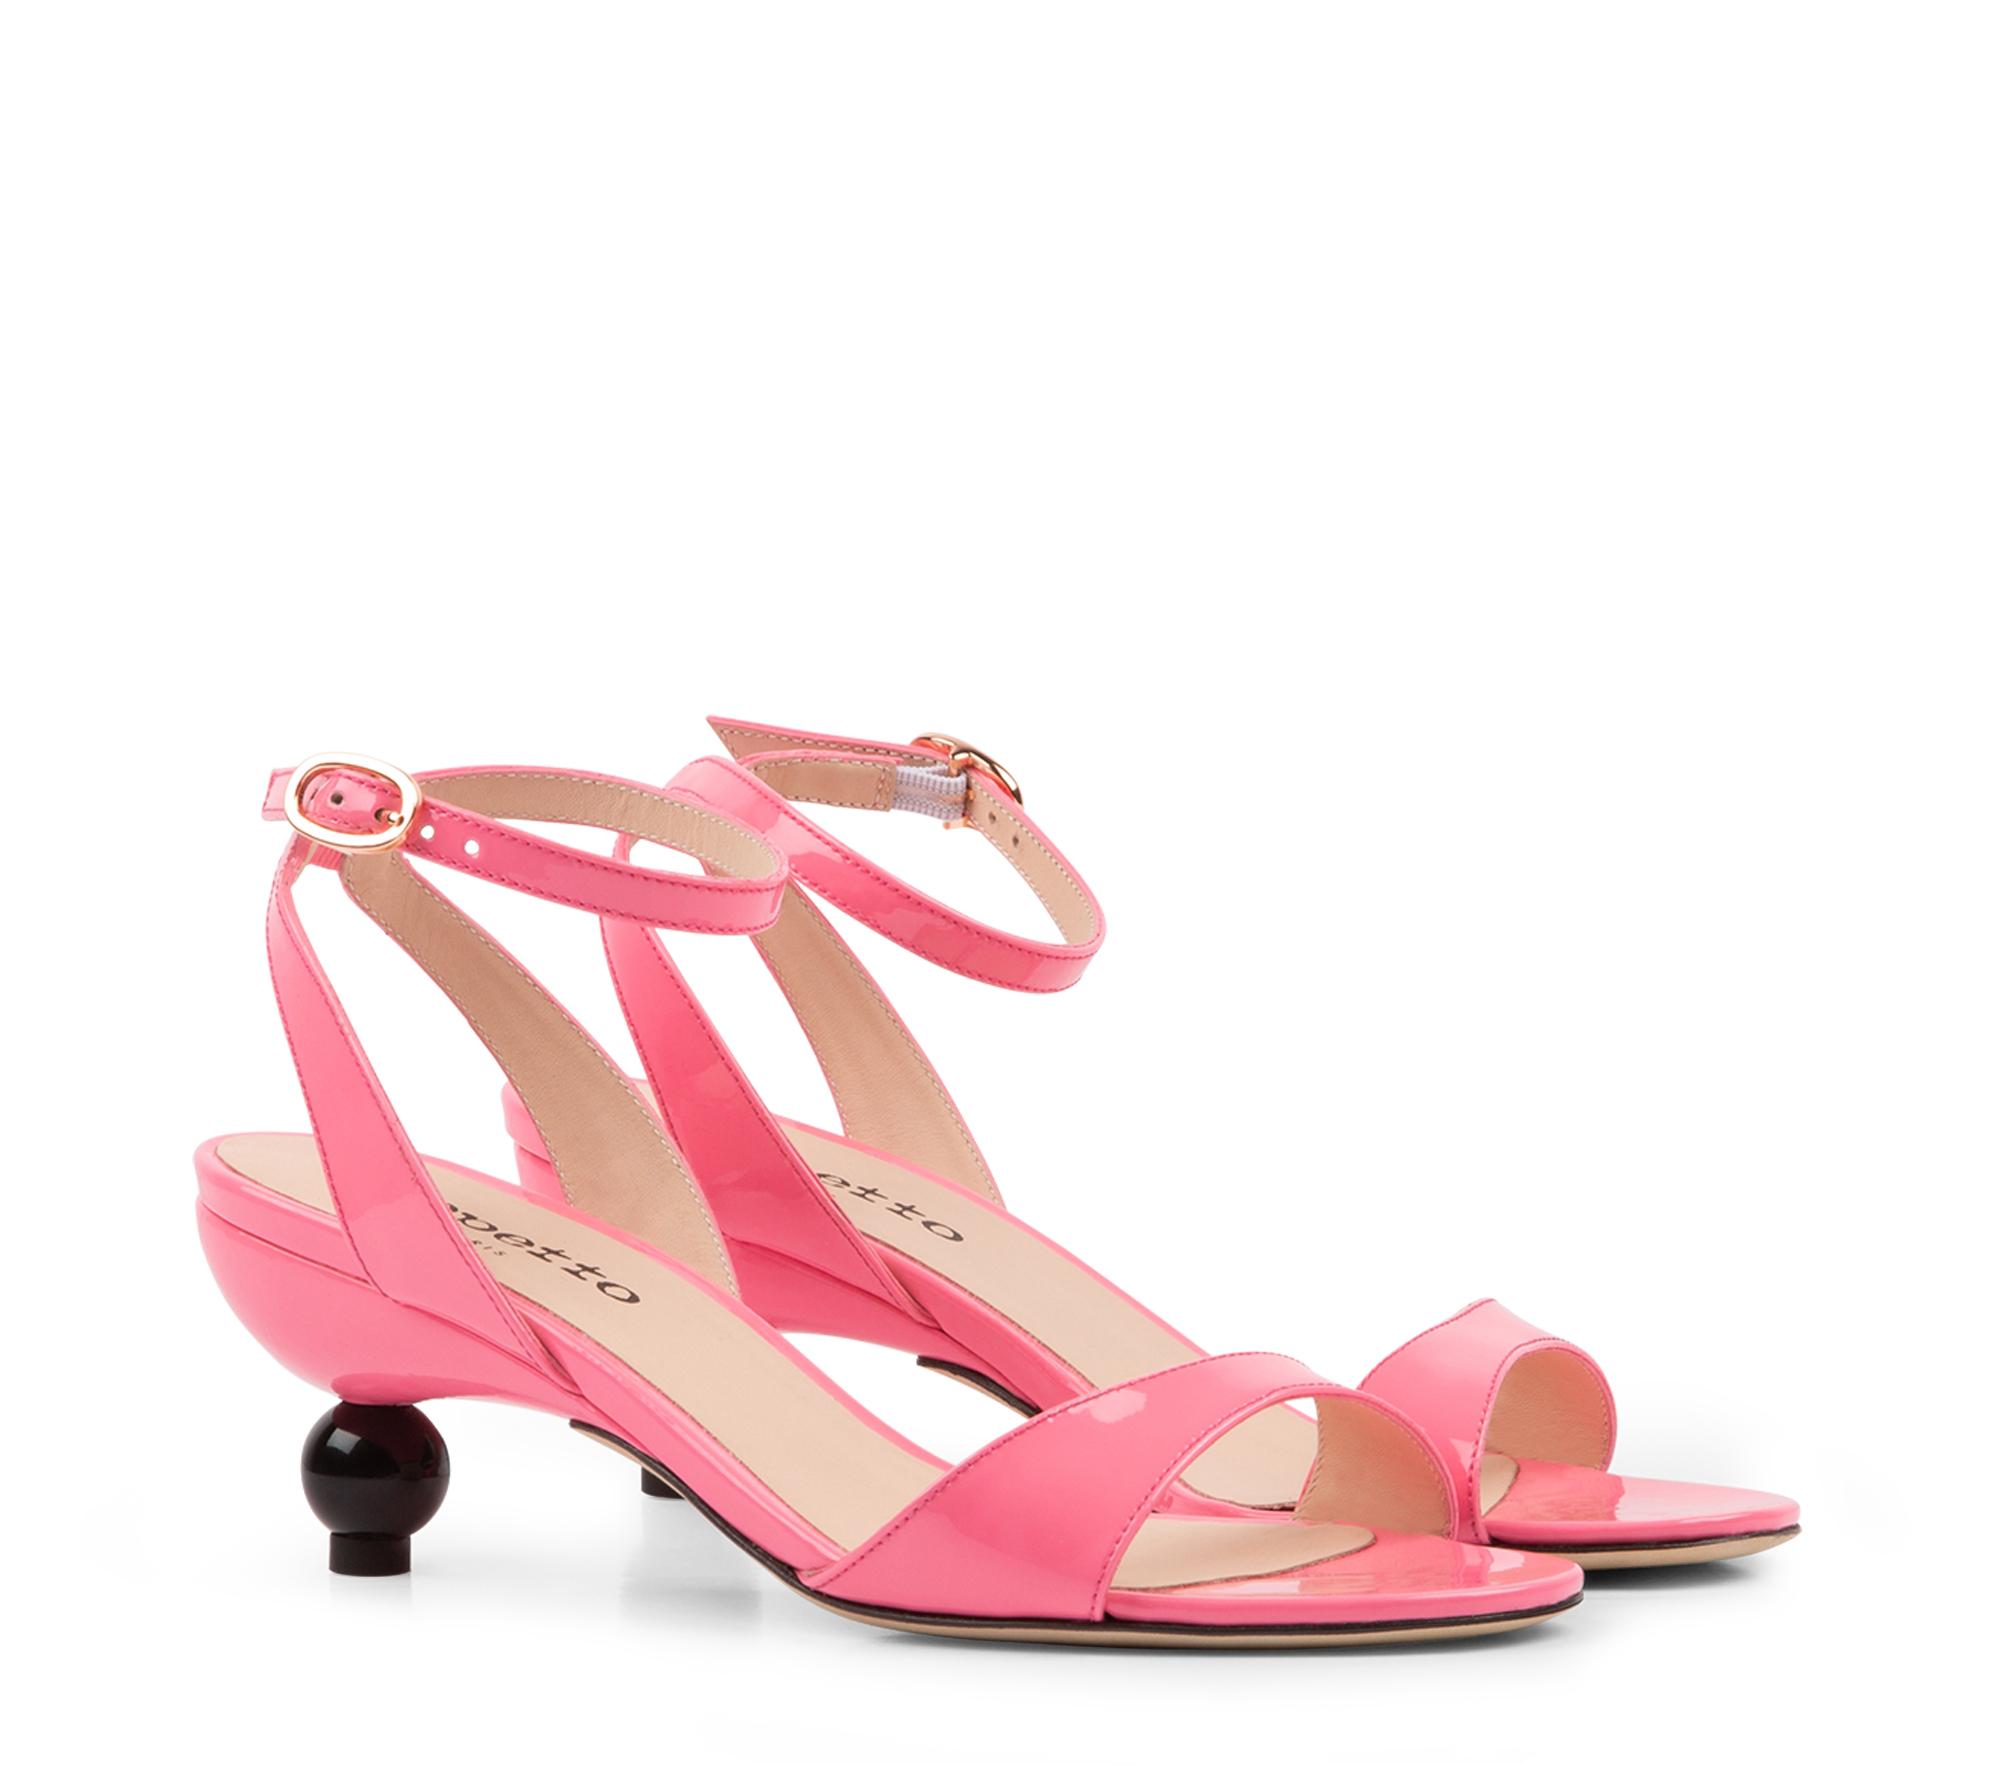 Lore sandals